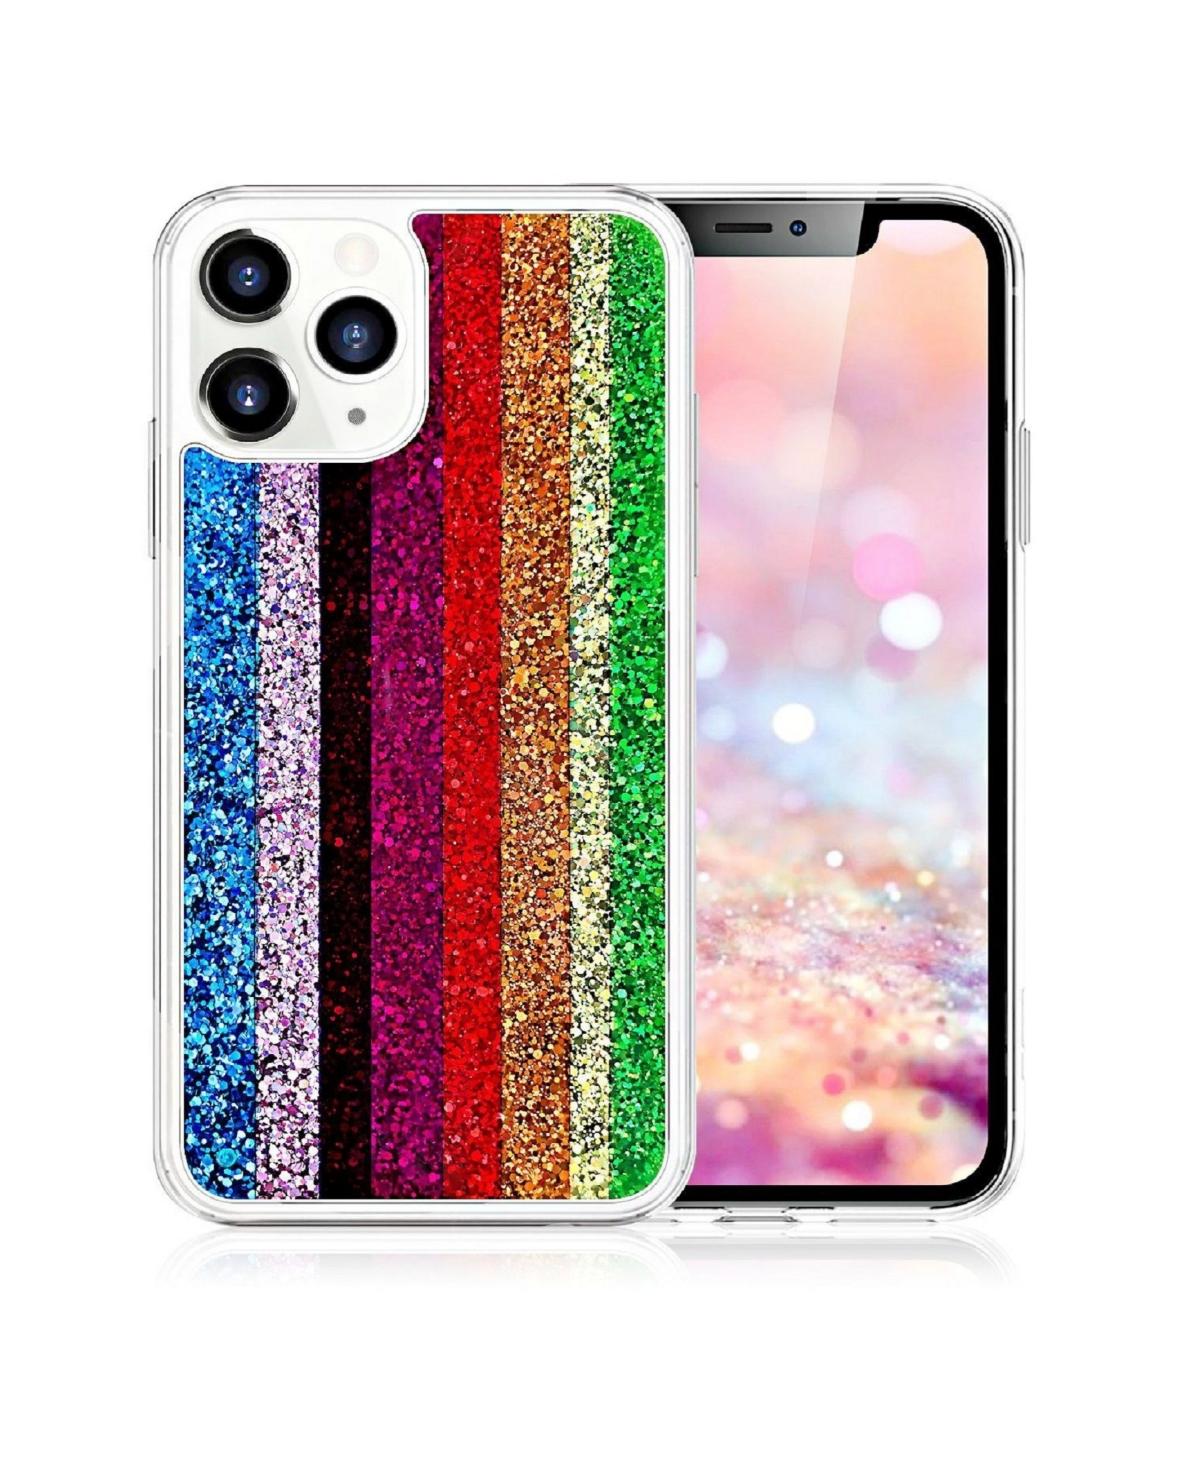 Milanblocks iPhone 11 Pro Rainbow Glitter Phone Case